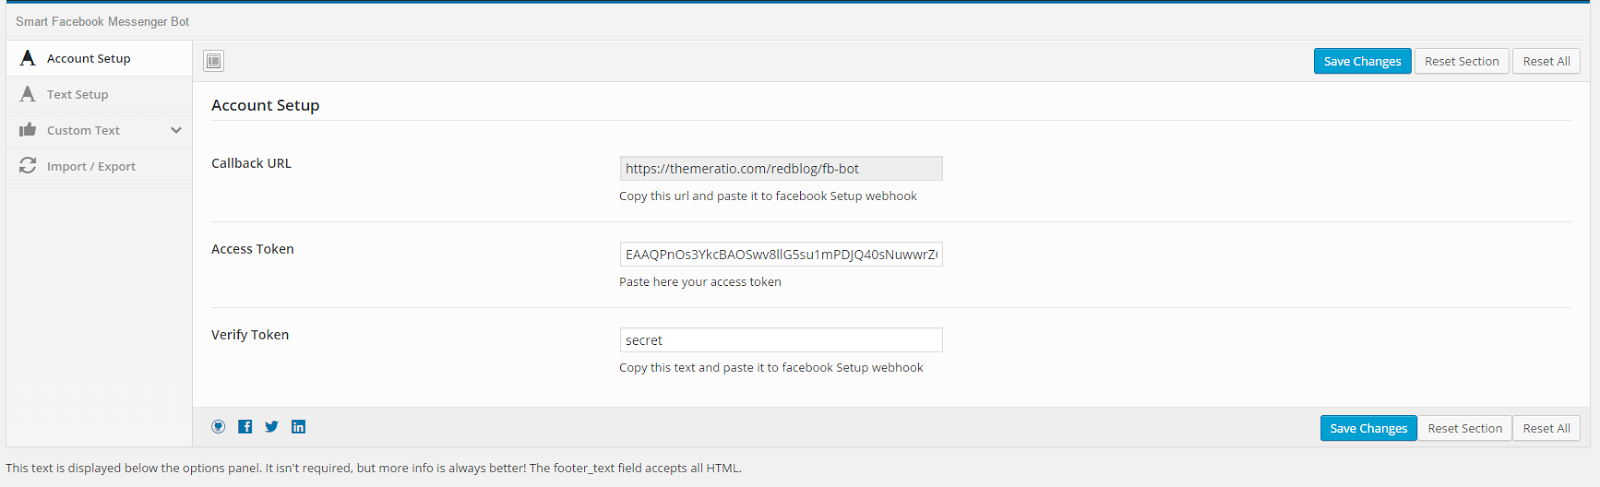 facebook messenger chat bot account set up